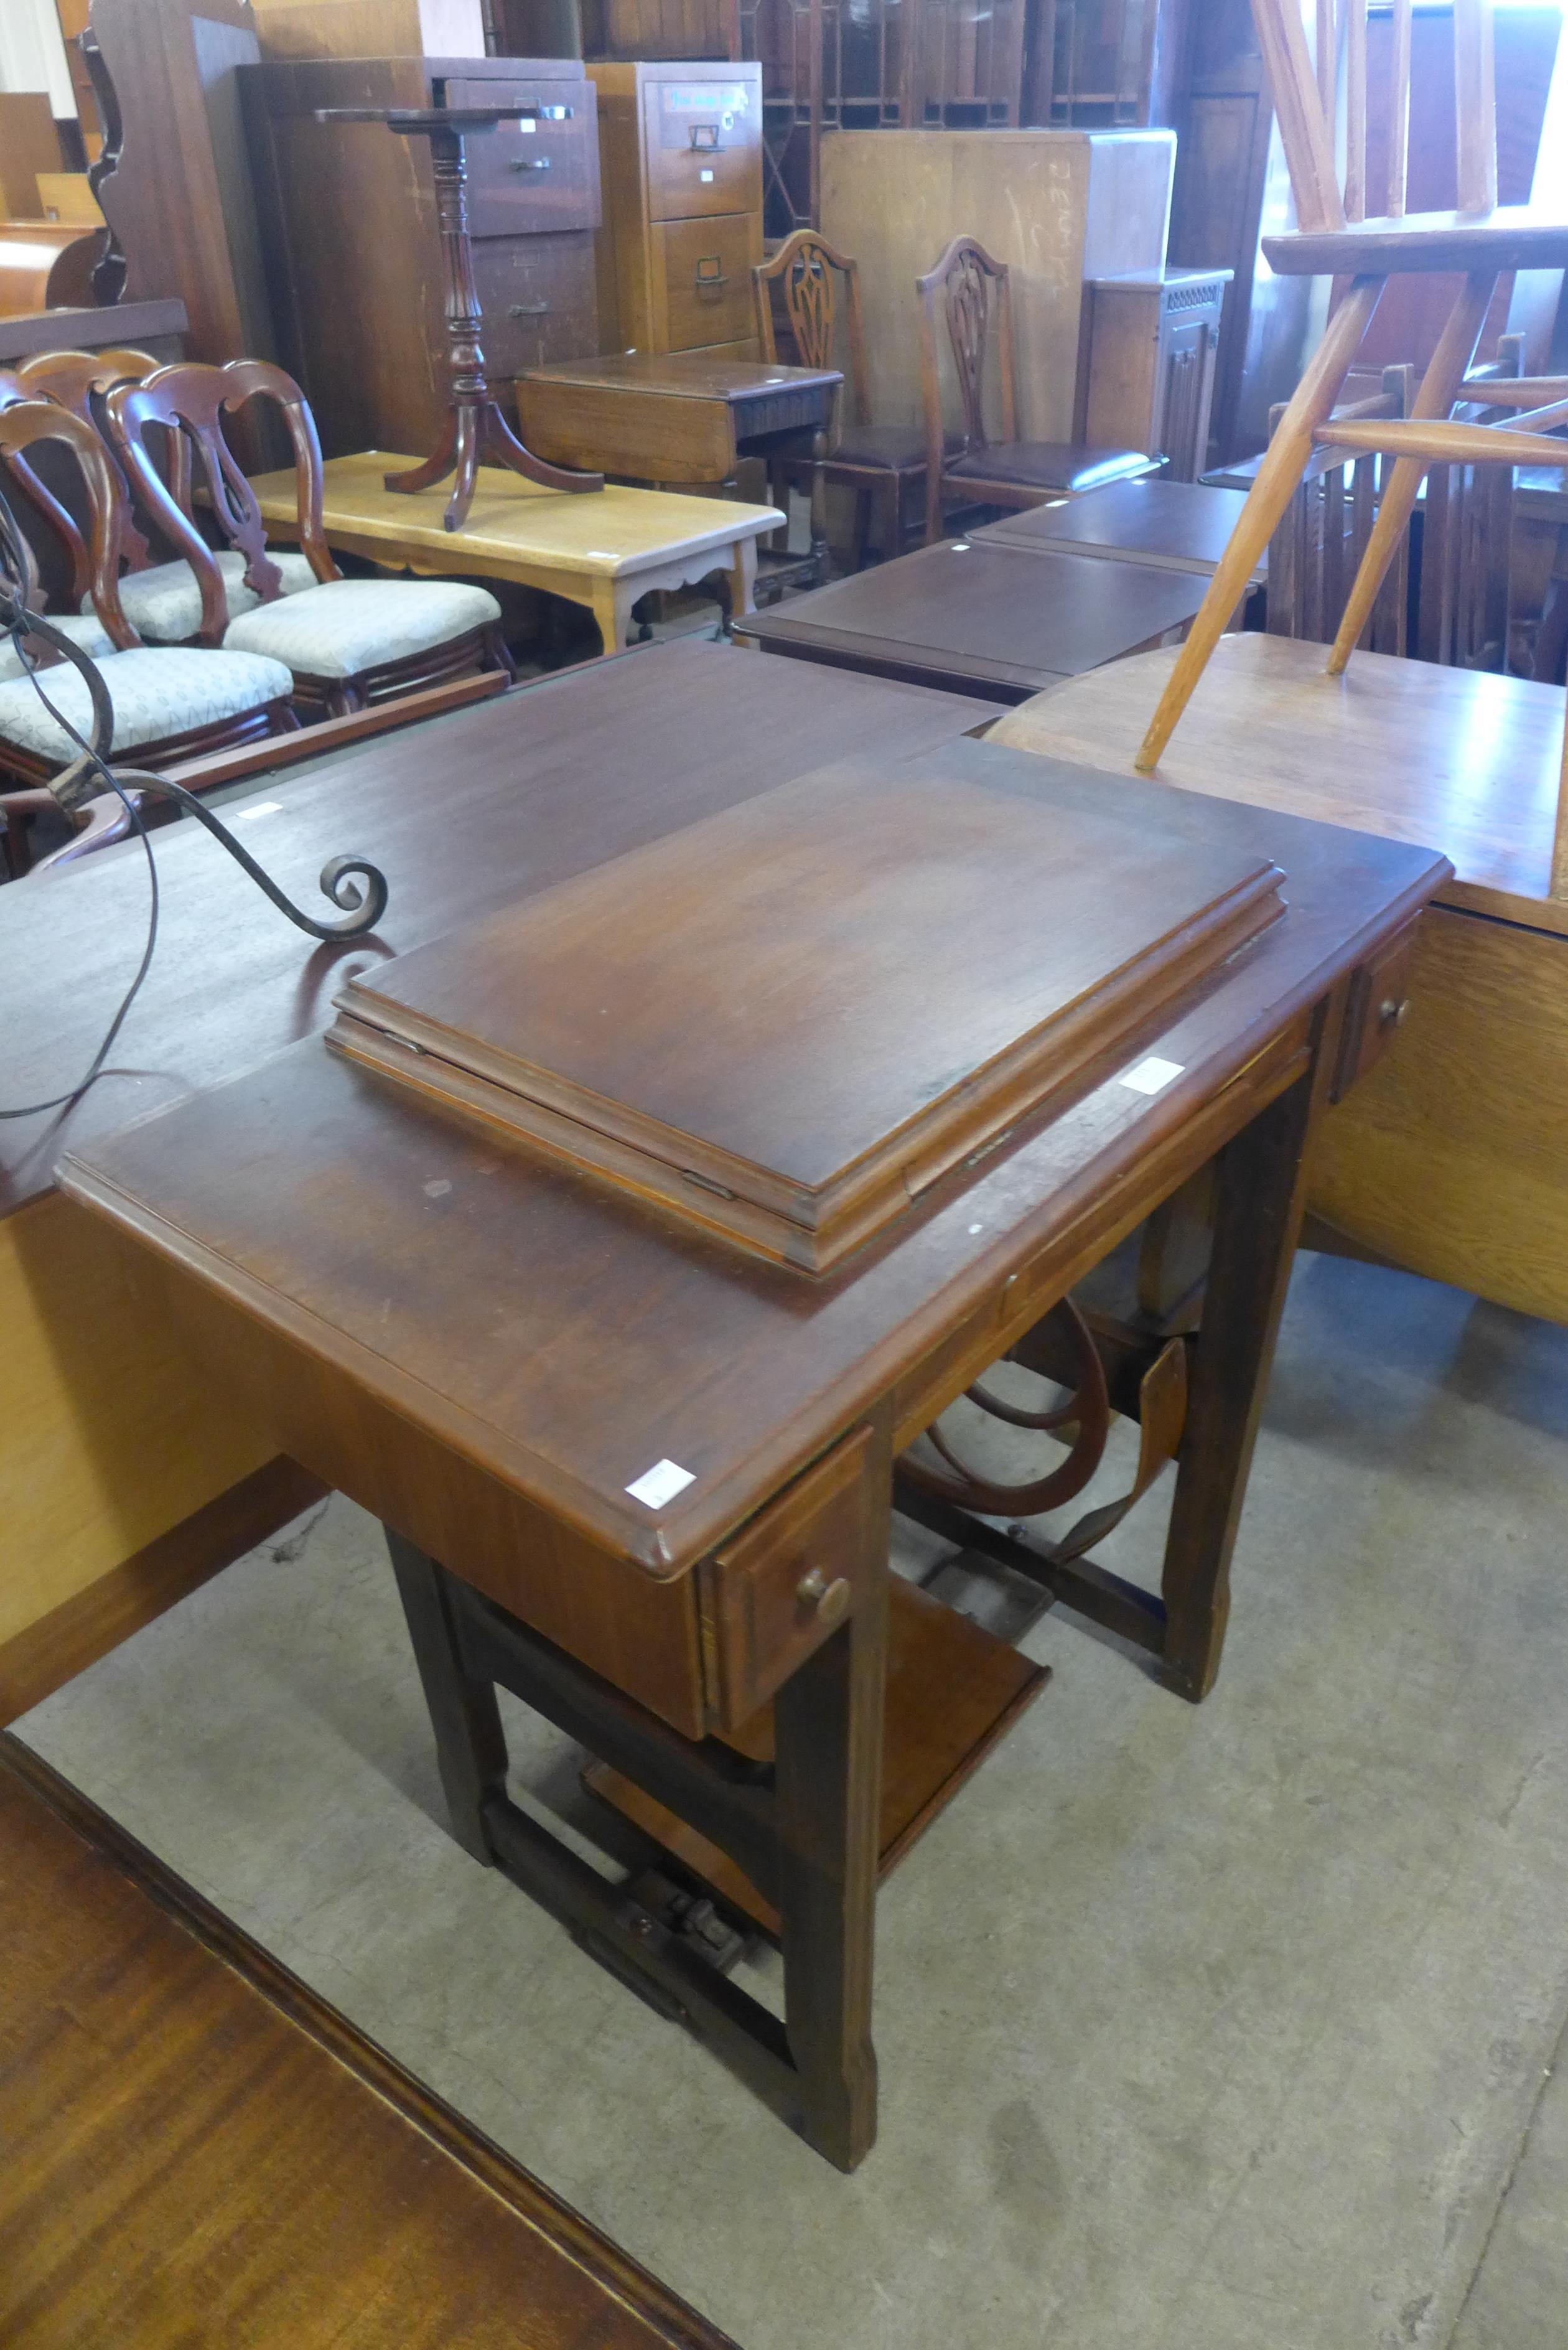 A Jones treadle sewing machine - Image 2 of 2